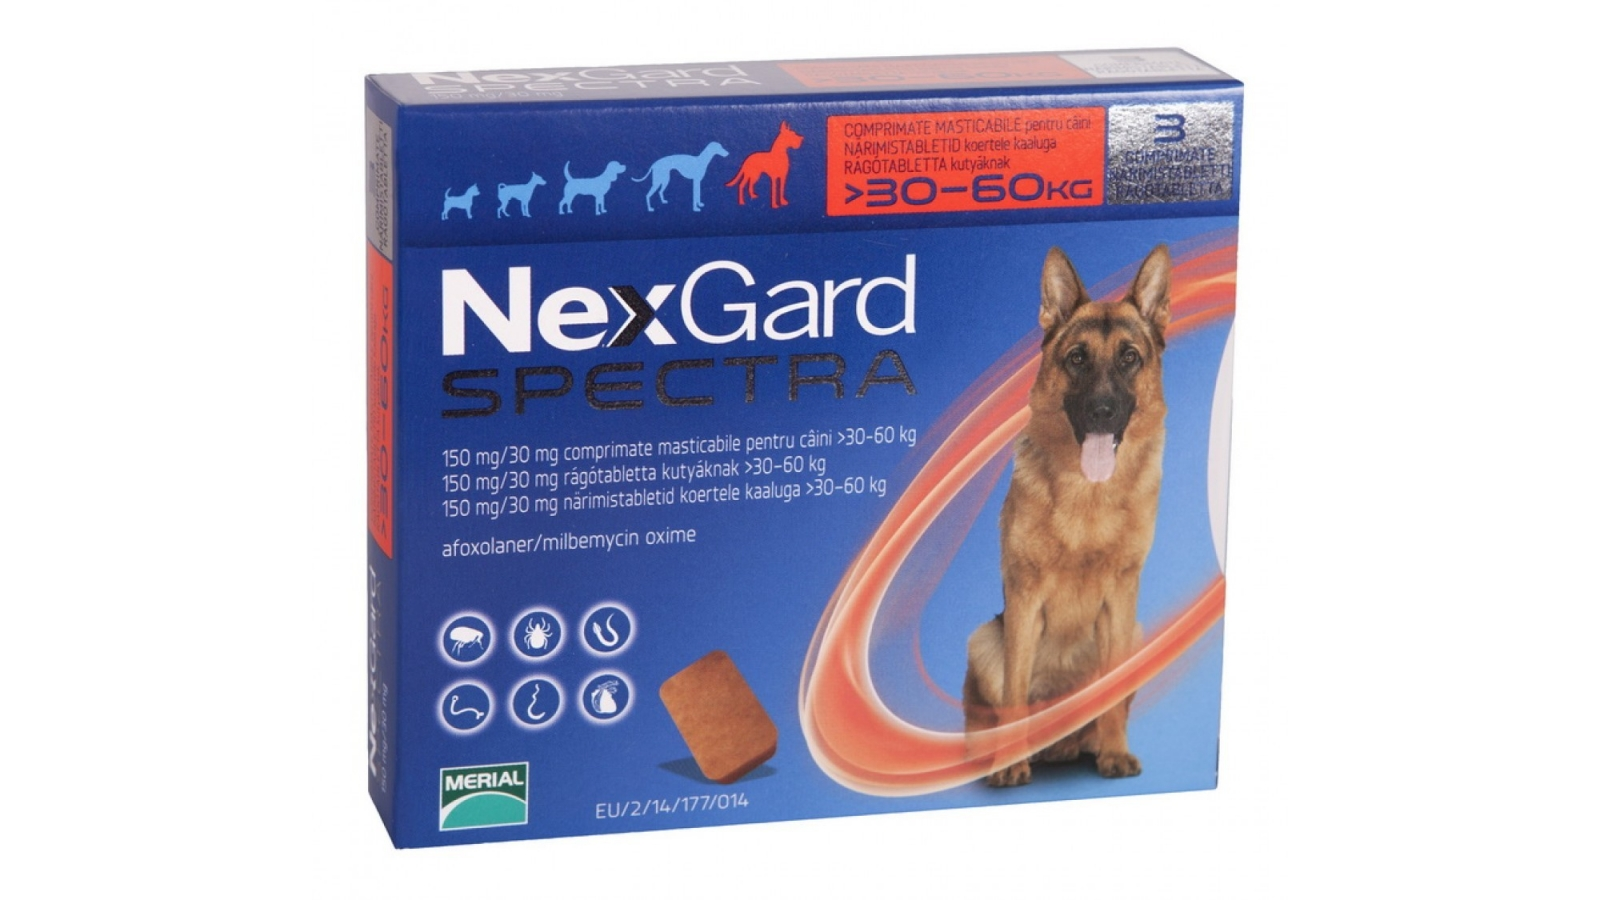 Nexgard Spectra Caine XL 30-60 kg Kg x 1 Tableta shop4pet.ro